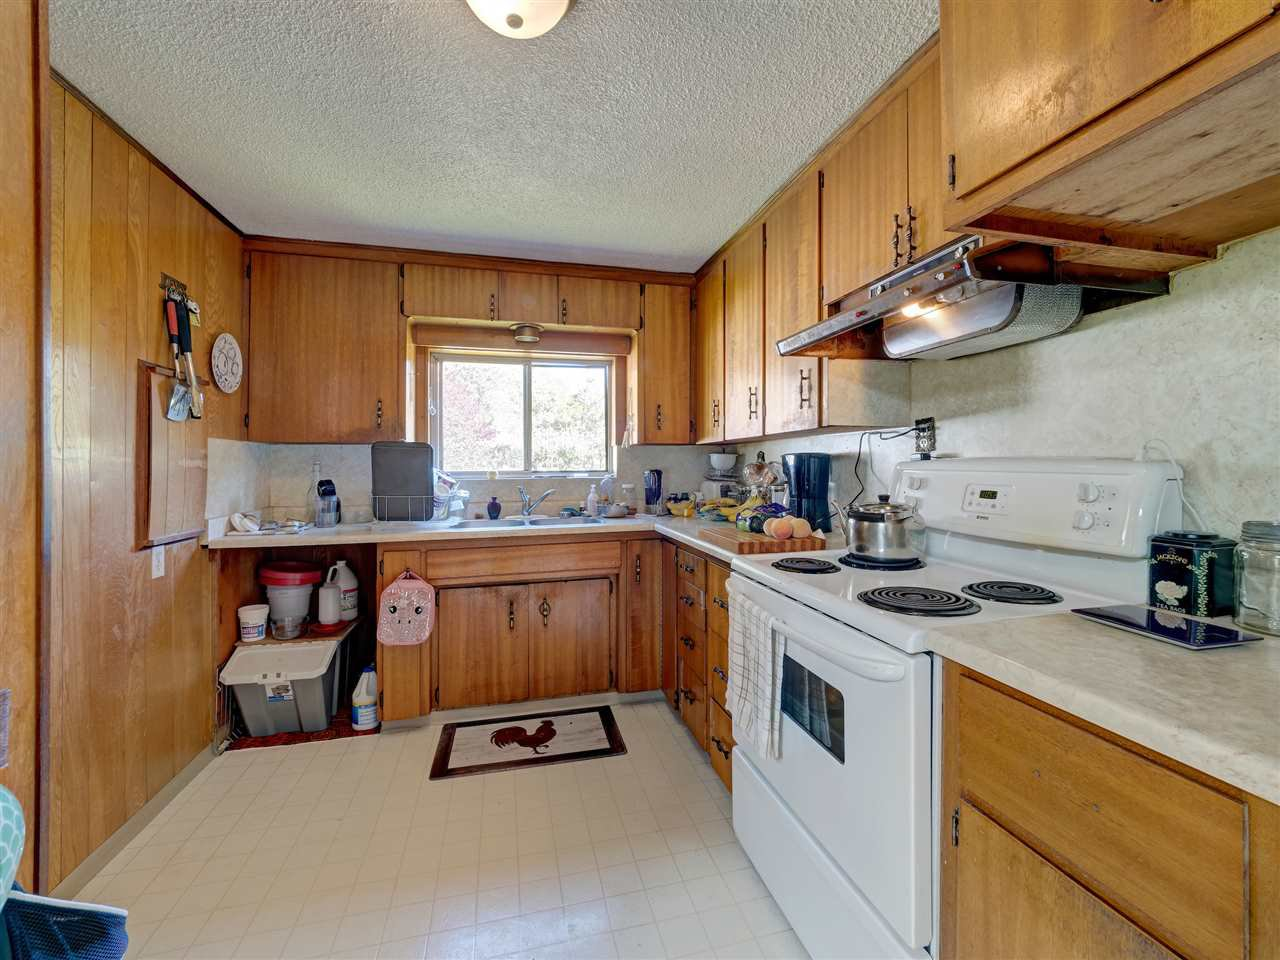 Photo 8: Photos: 5761 MCLAUGHAN Road in Sechelt: Sechelt District House for sale (Sunshine Coast)  : MLS®# R2479077